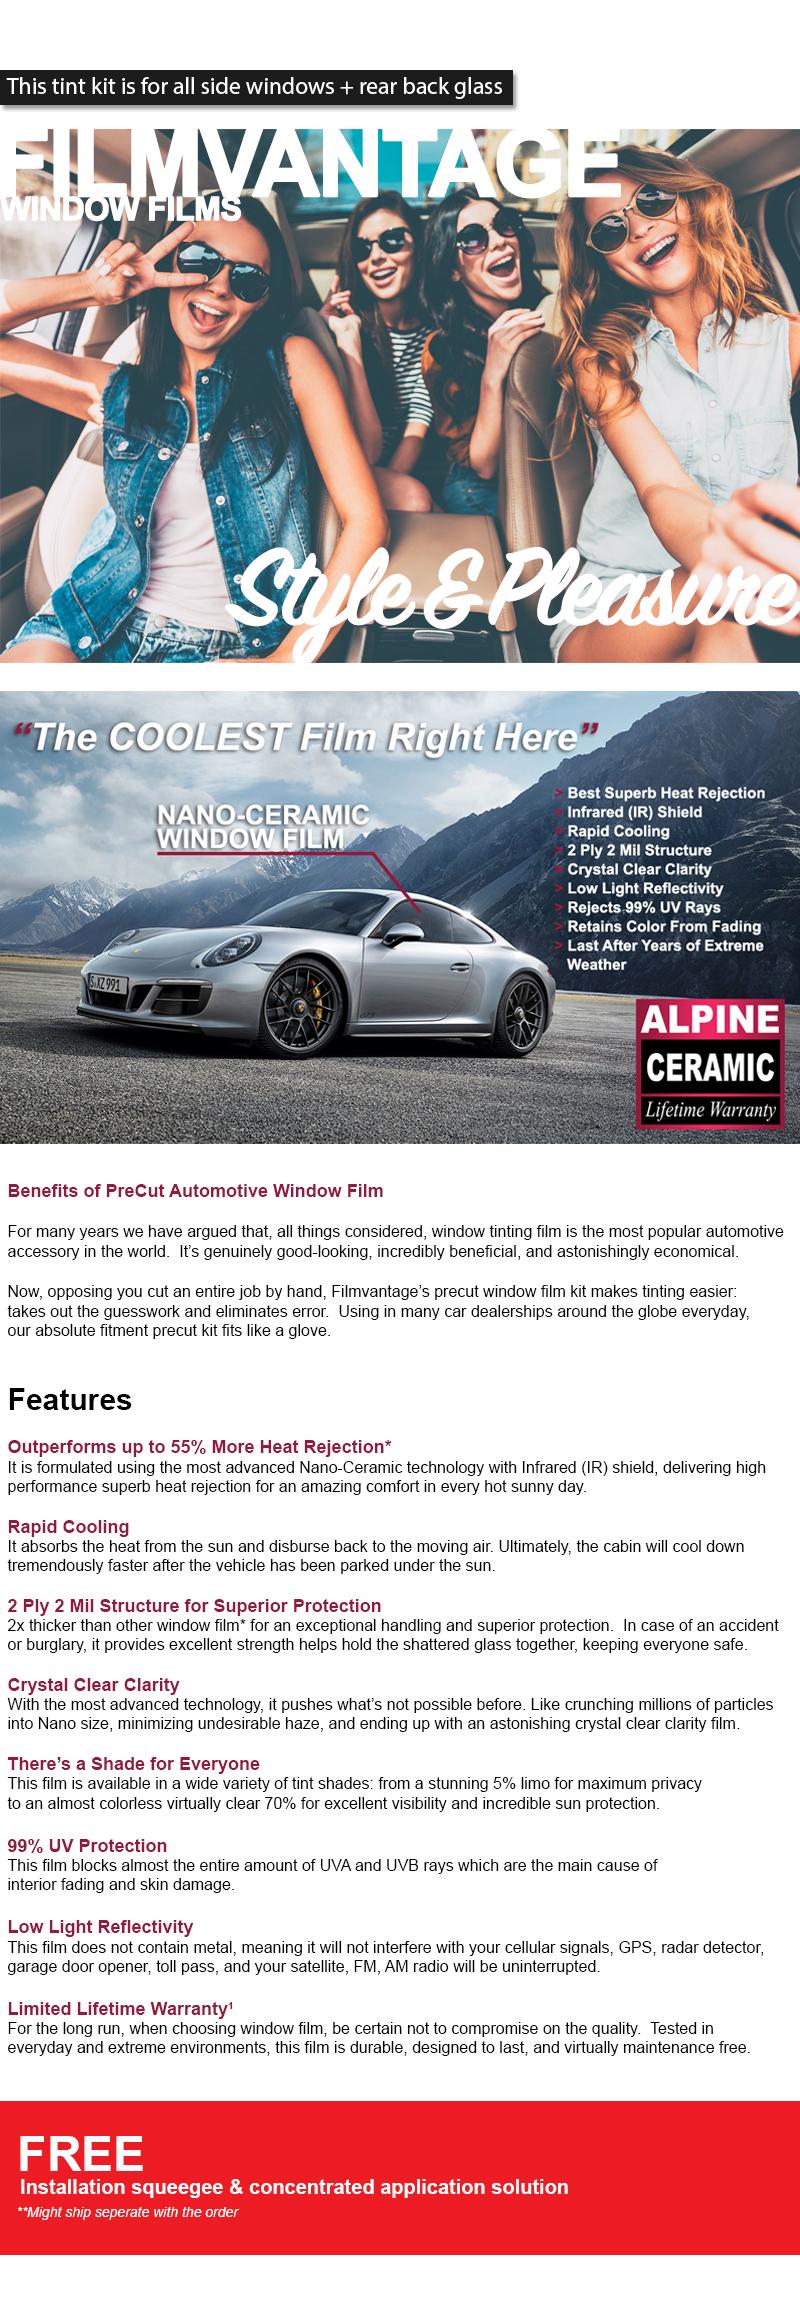 ALPINE PRECUT AUTO WINDOW TINTING TINT FILM FOR LEXUS GS 350 07-12